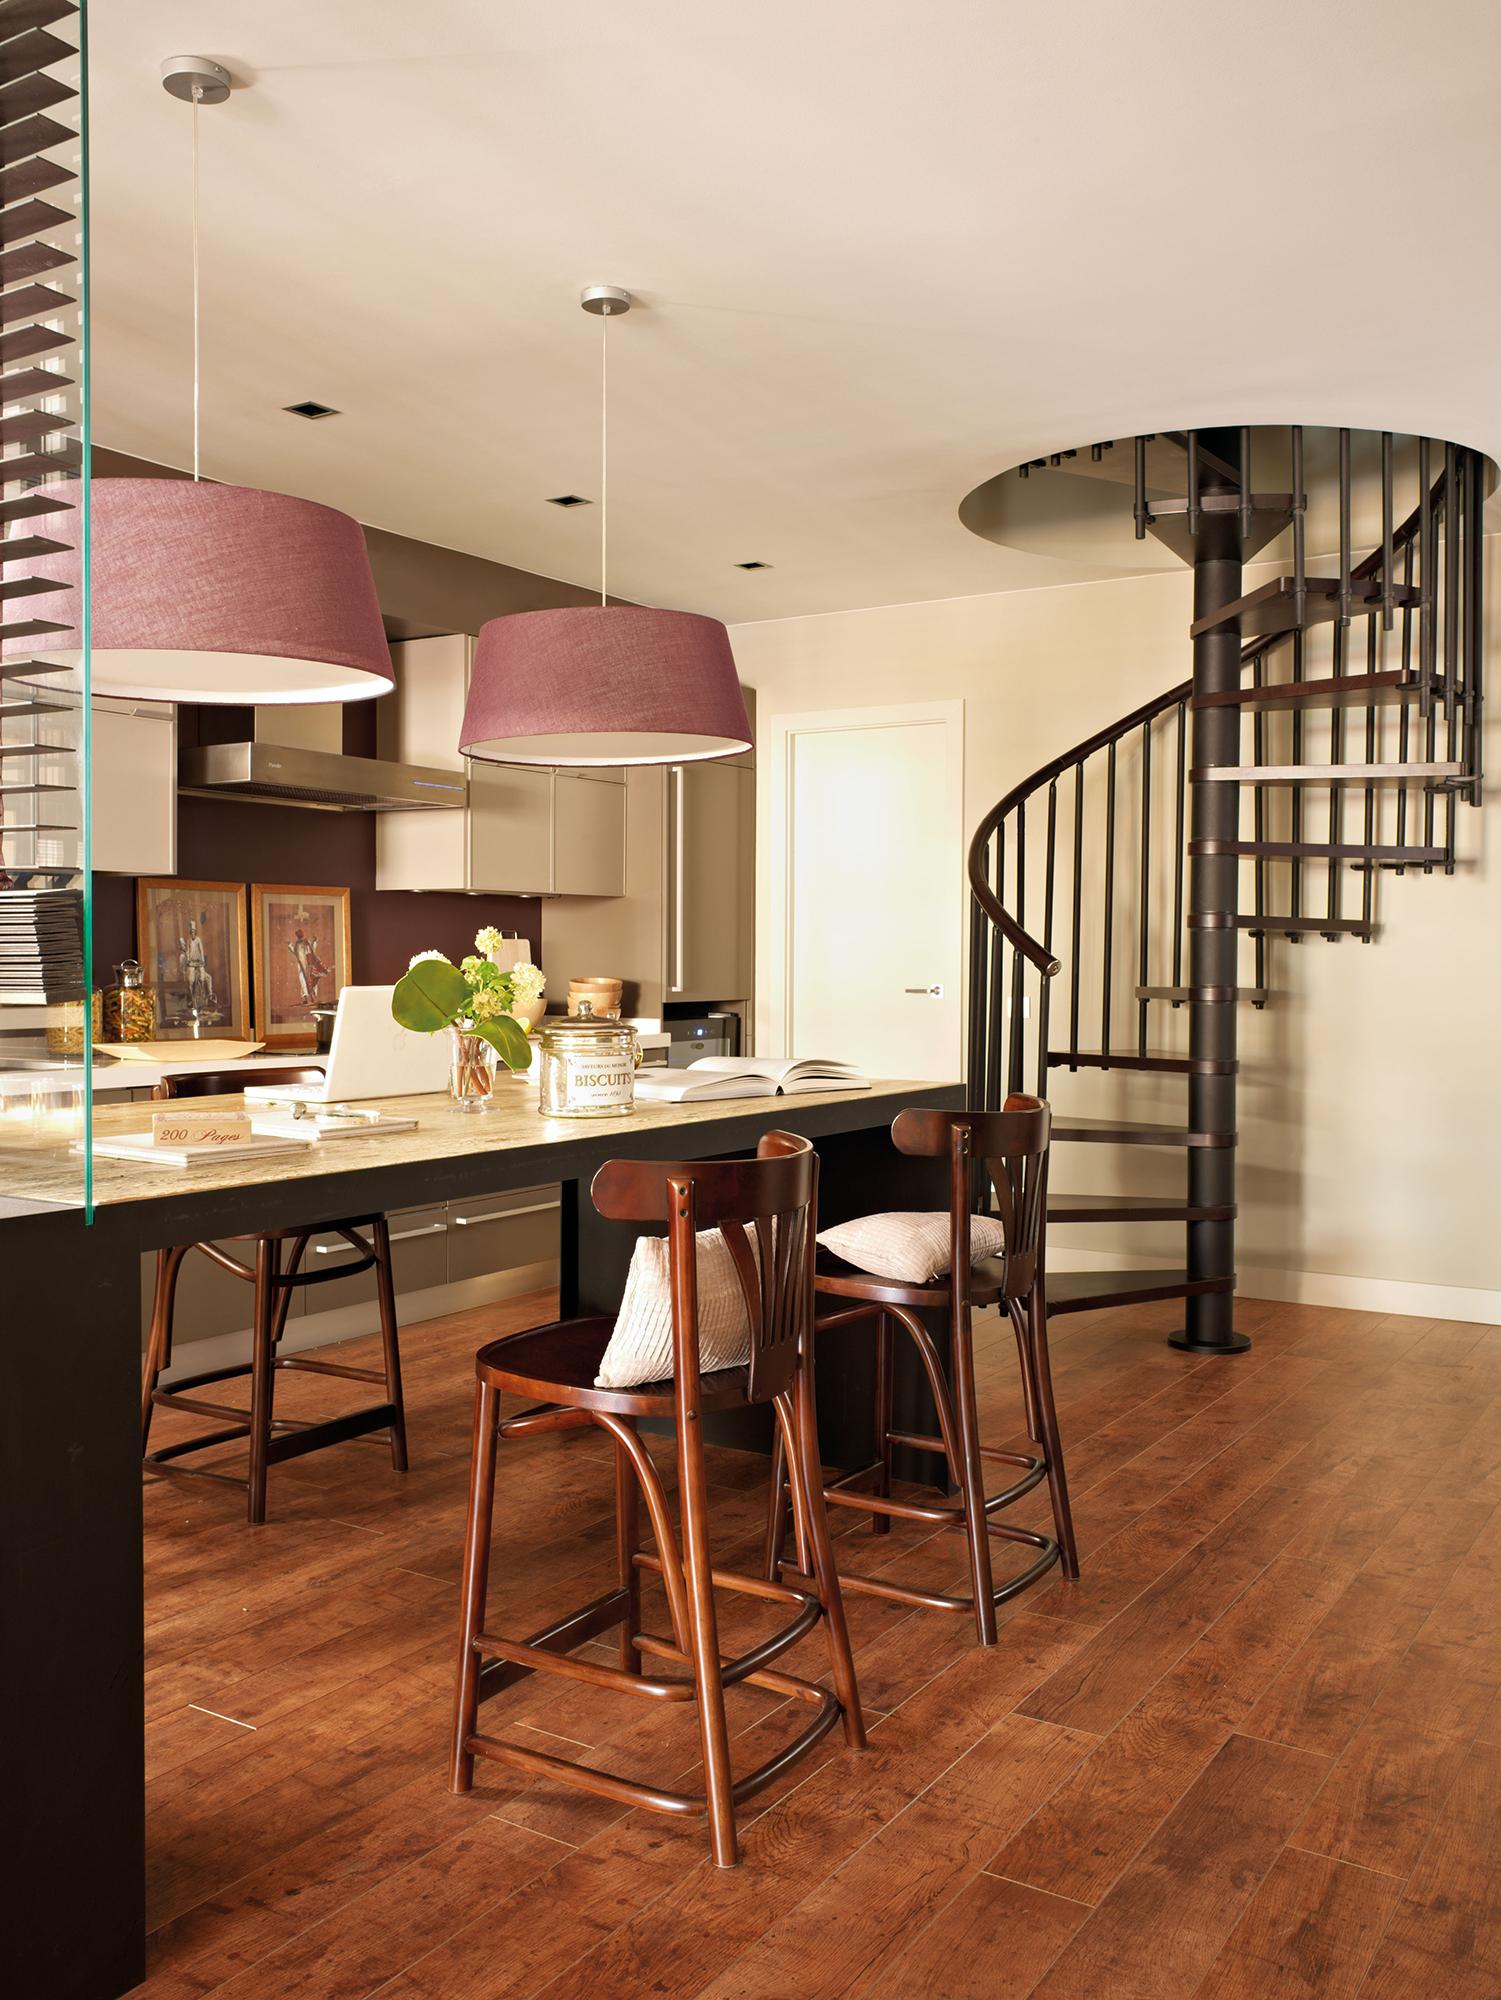 L mparas for Escalera de cocina